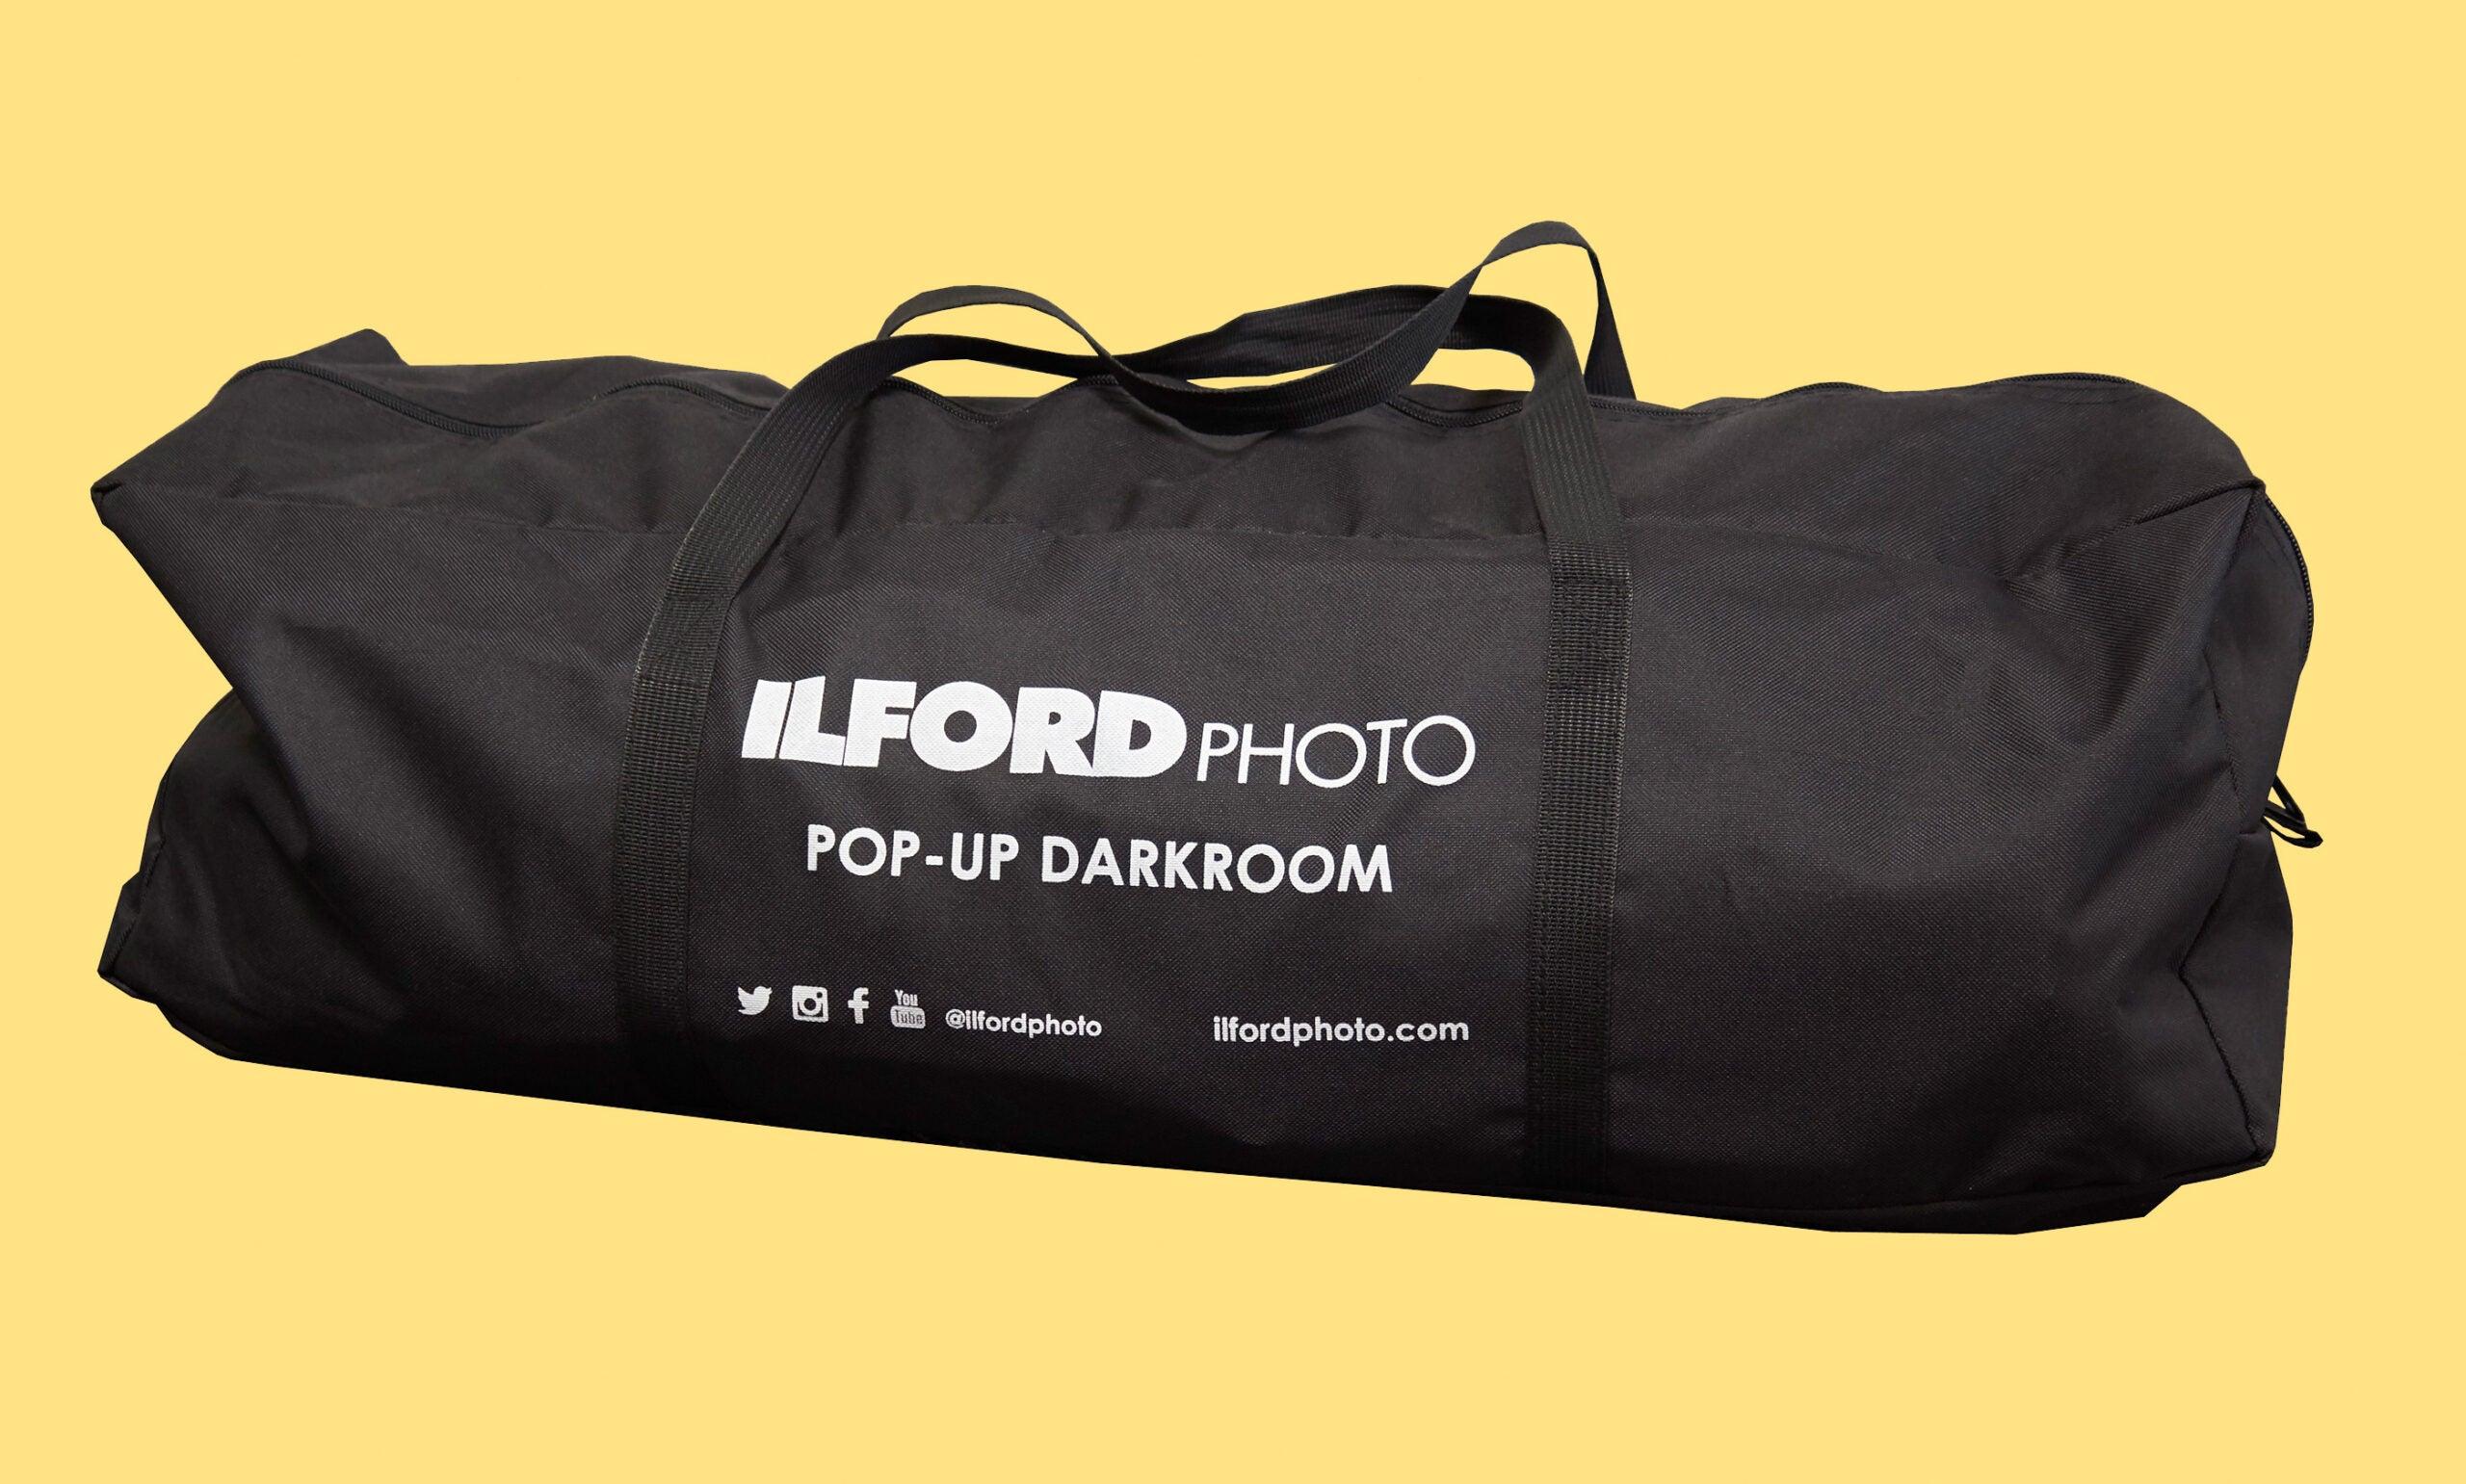 Ilford pop-up darkroom carry bag